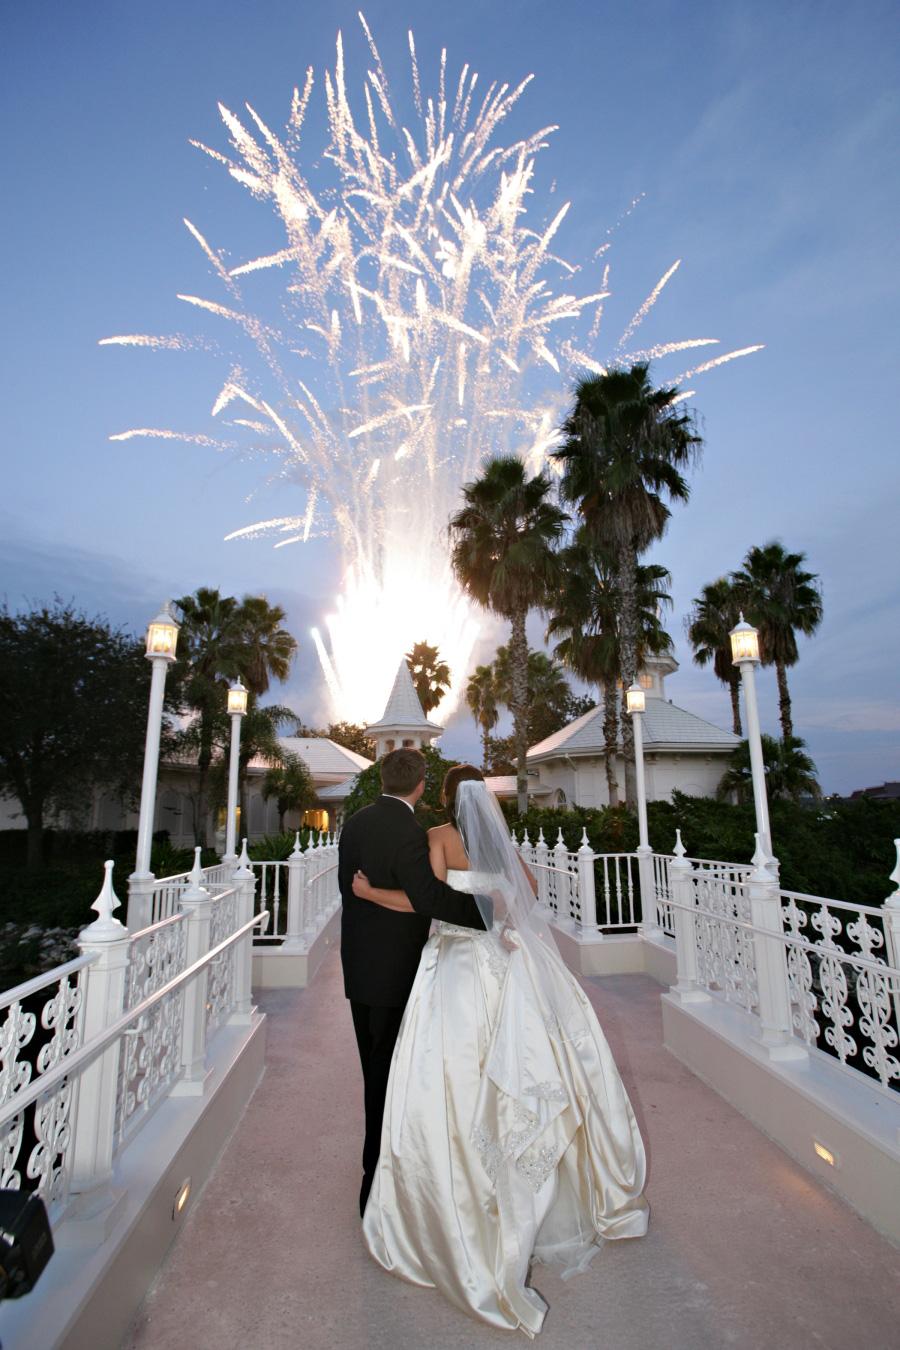 Disney wedding dresses 2008